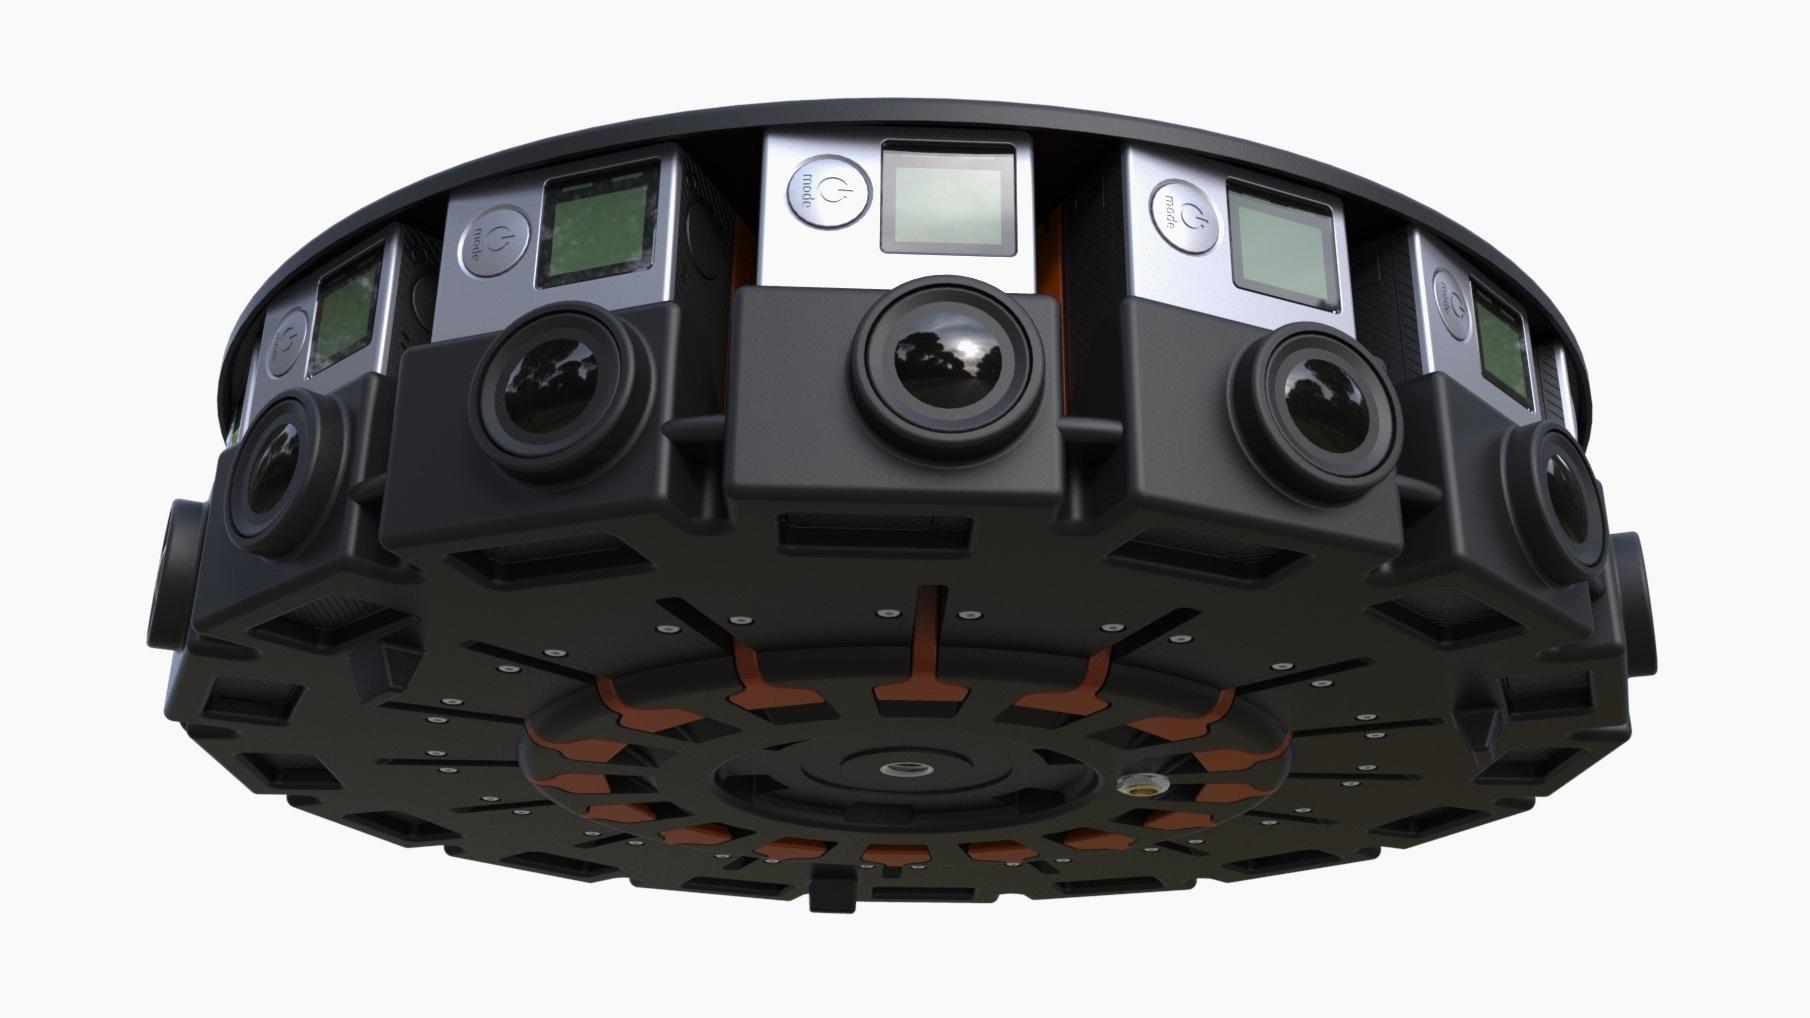 GoPro array